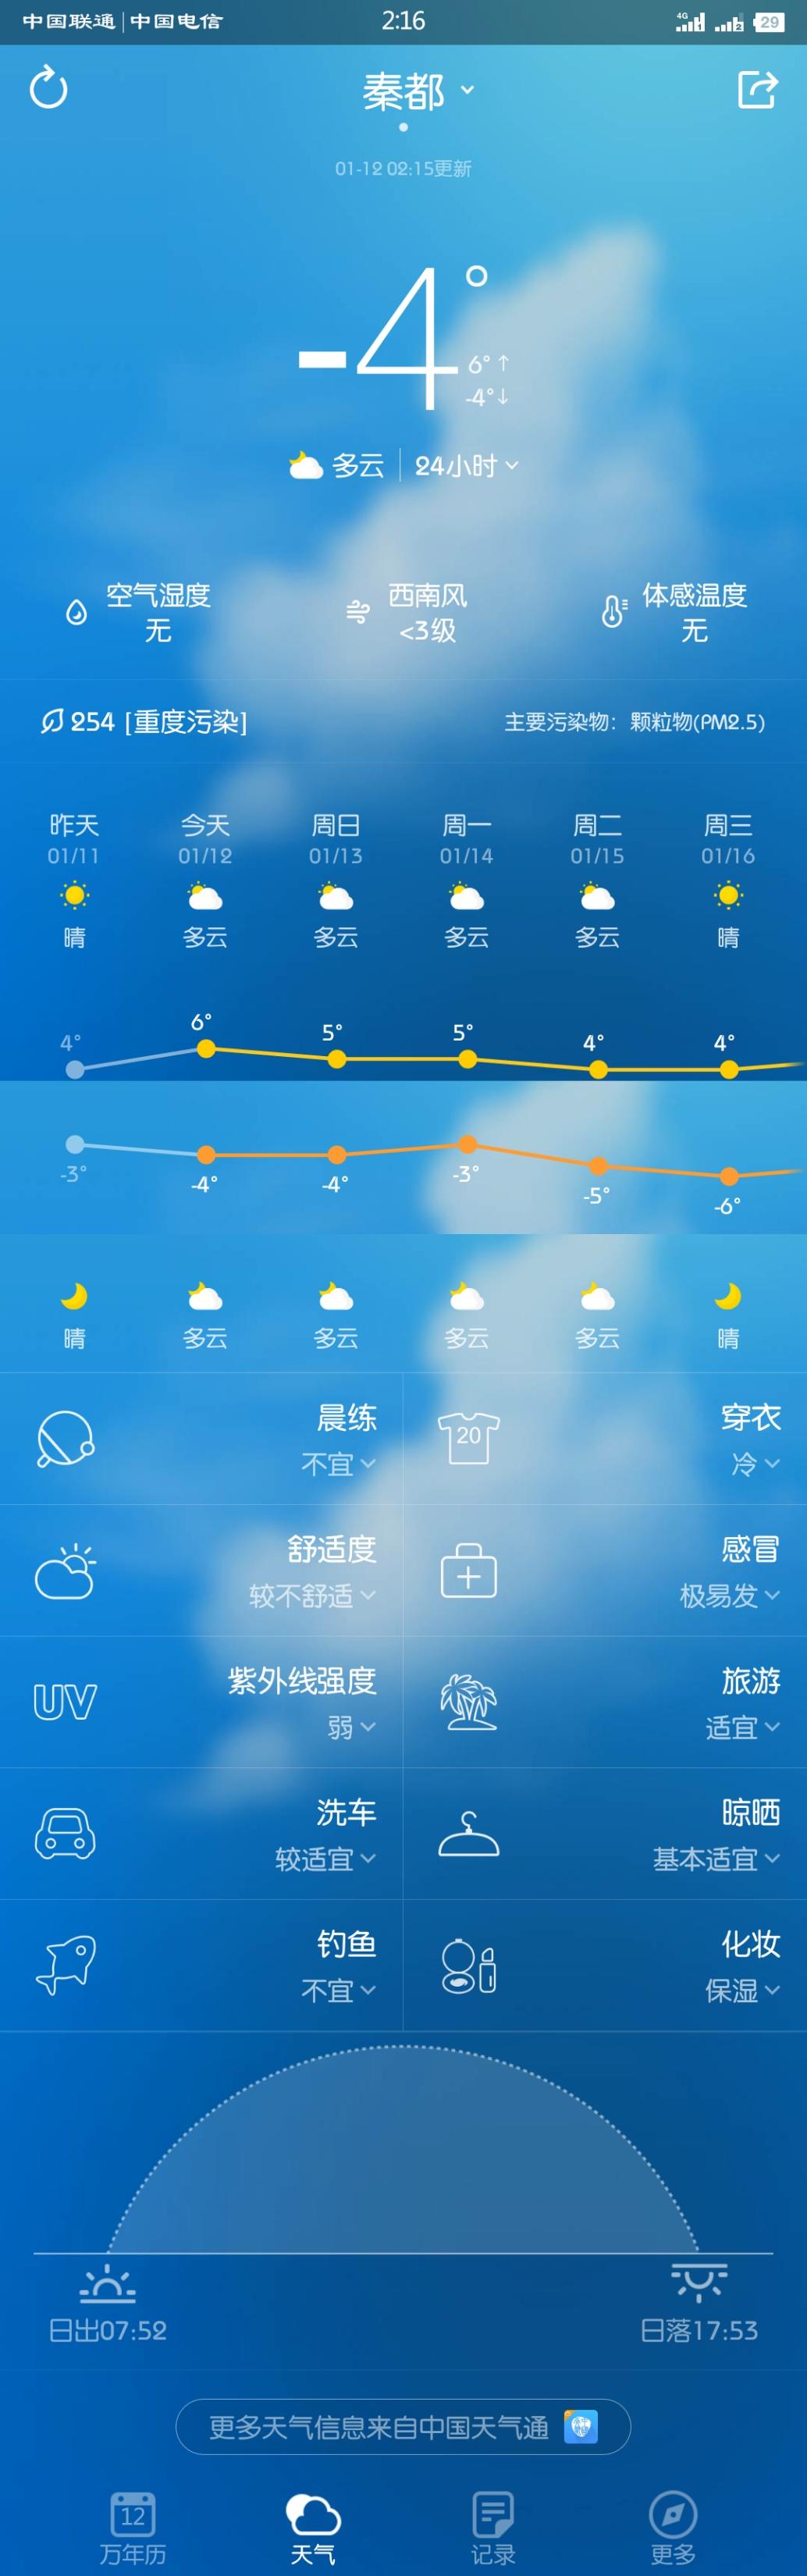 Screenshot_2019-01-12-02-16-40-751_?????.png